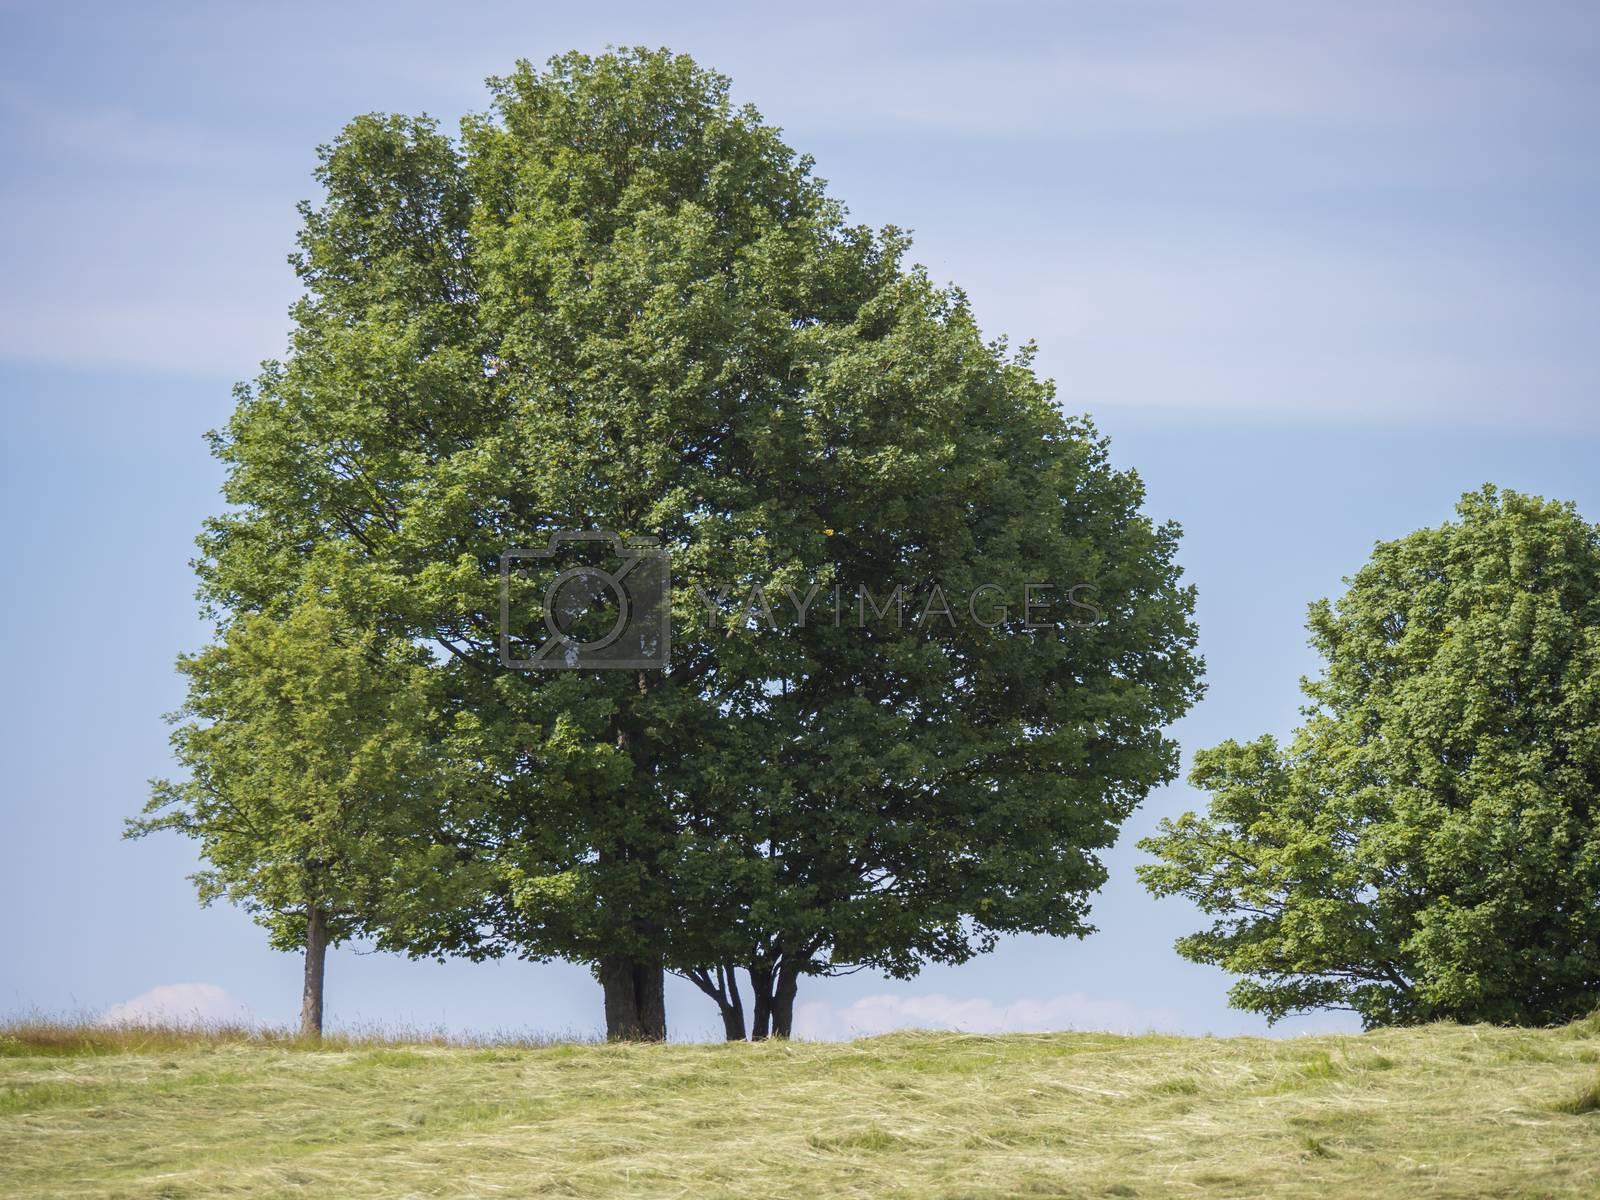 Big Linden Tree on mowed Meadow with summer rural Landscape, Blue Sky background.